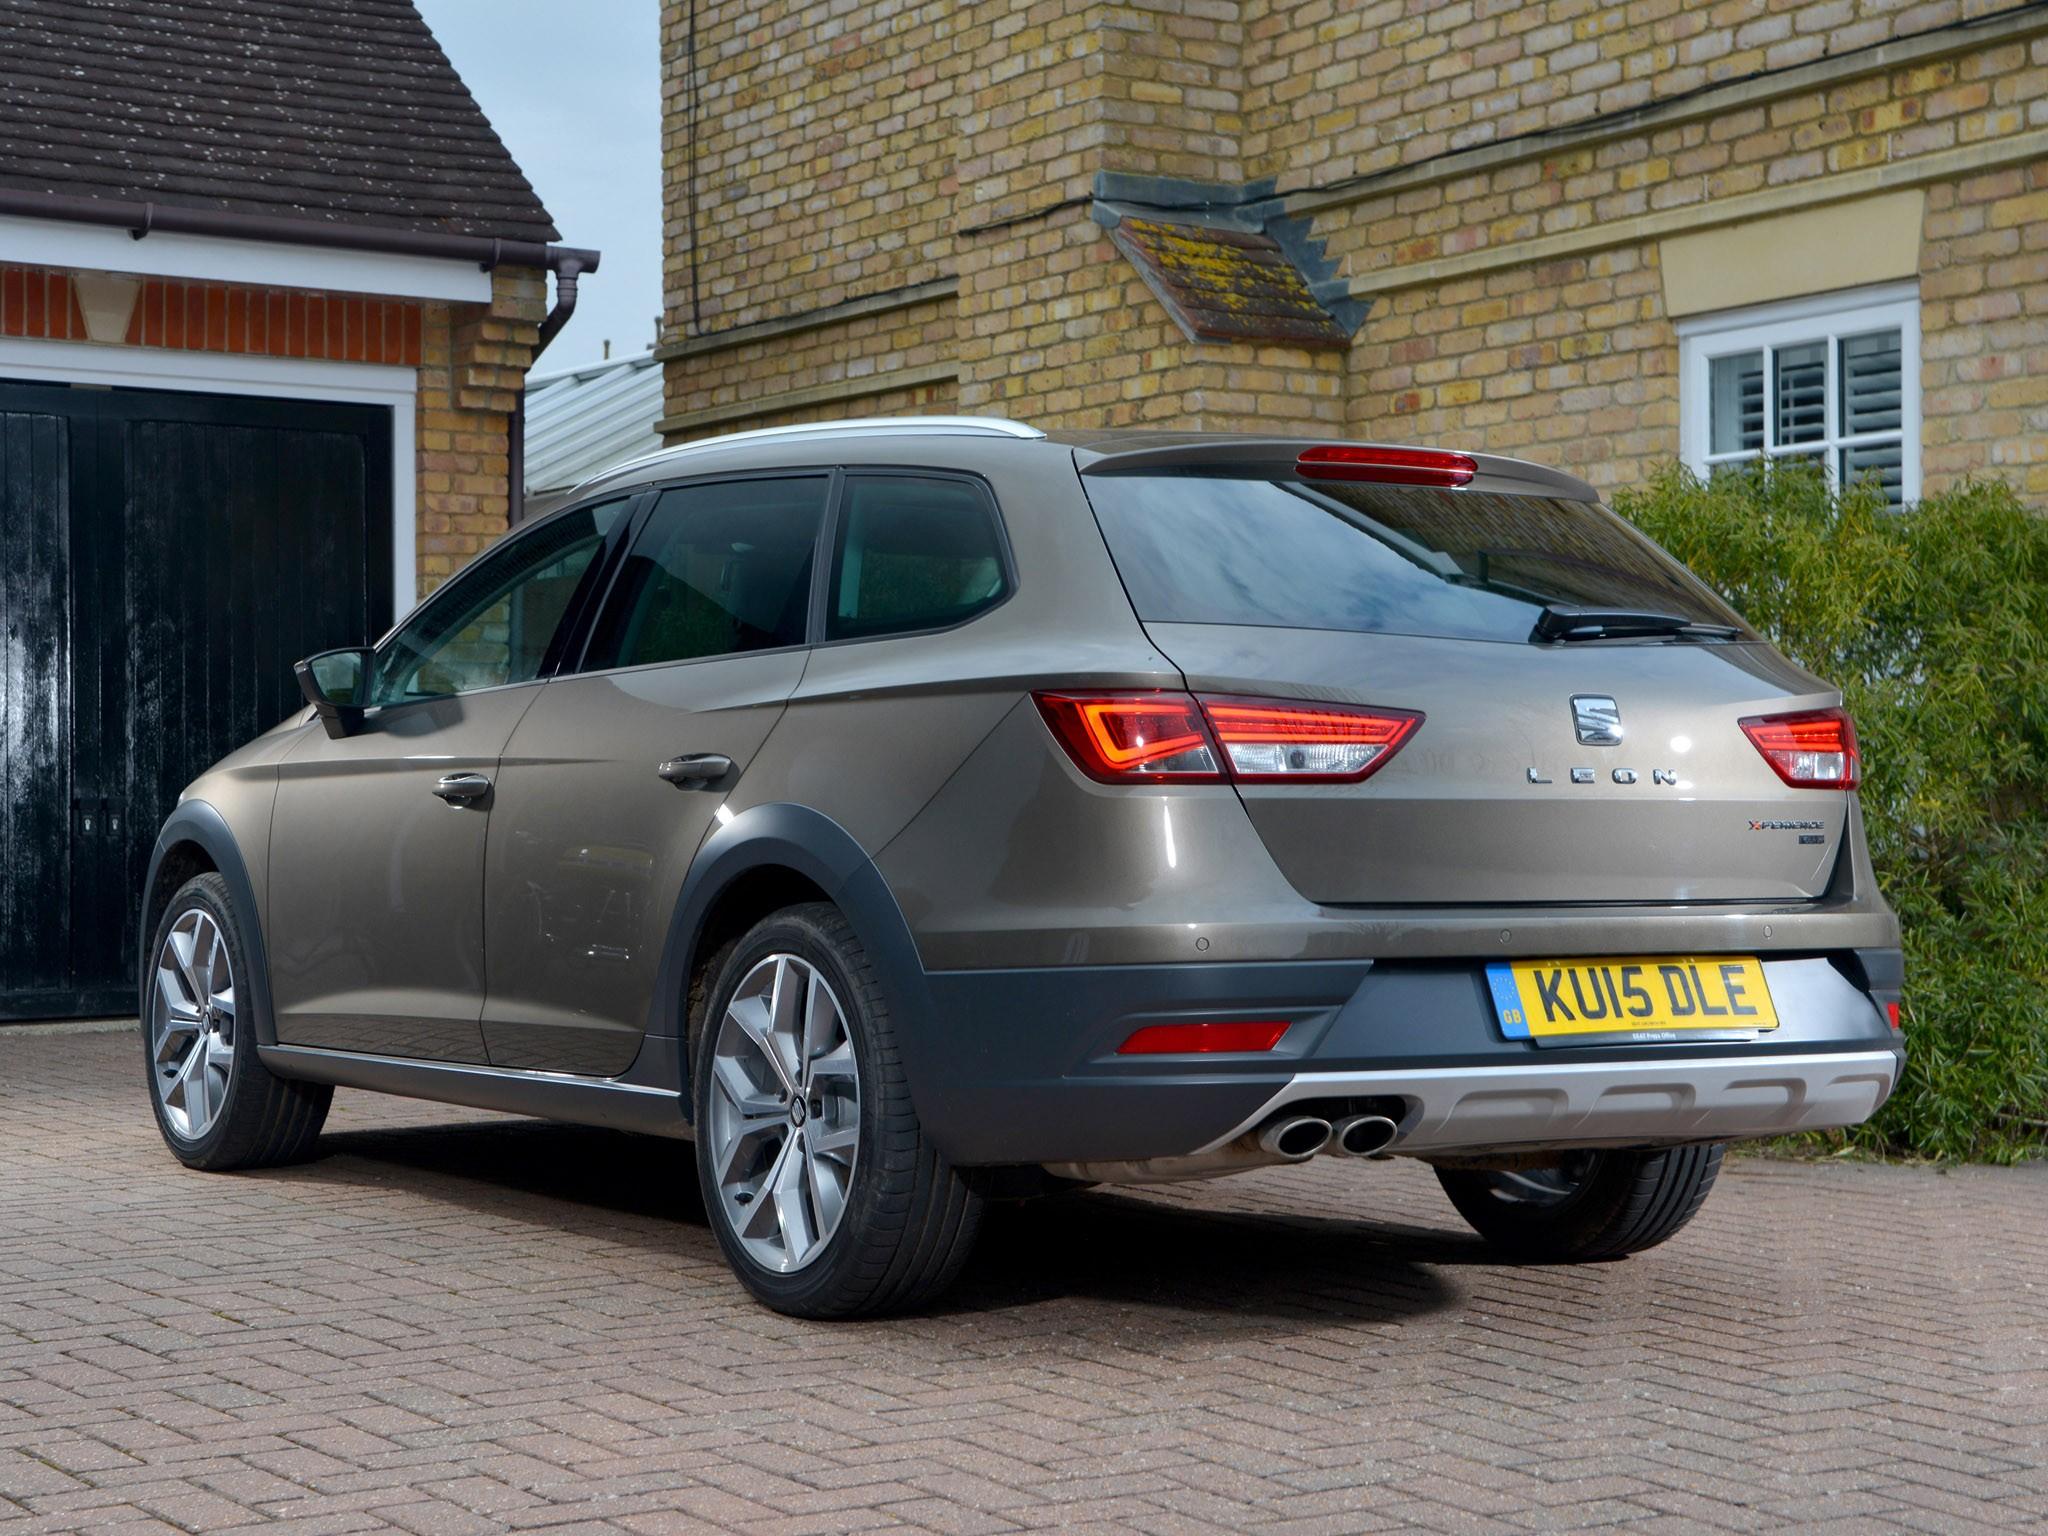 2015 Seat Leon X-Perience 4drive UK